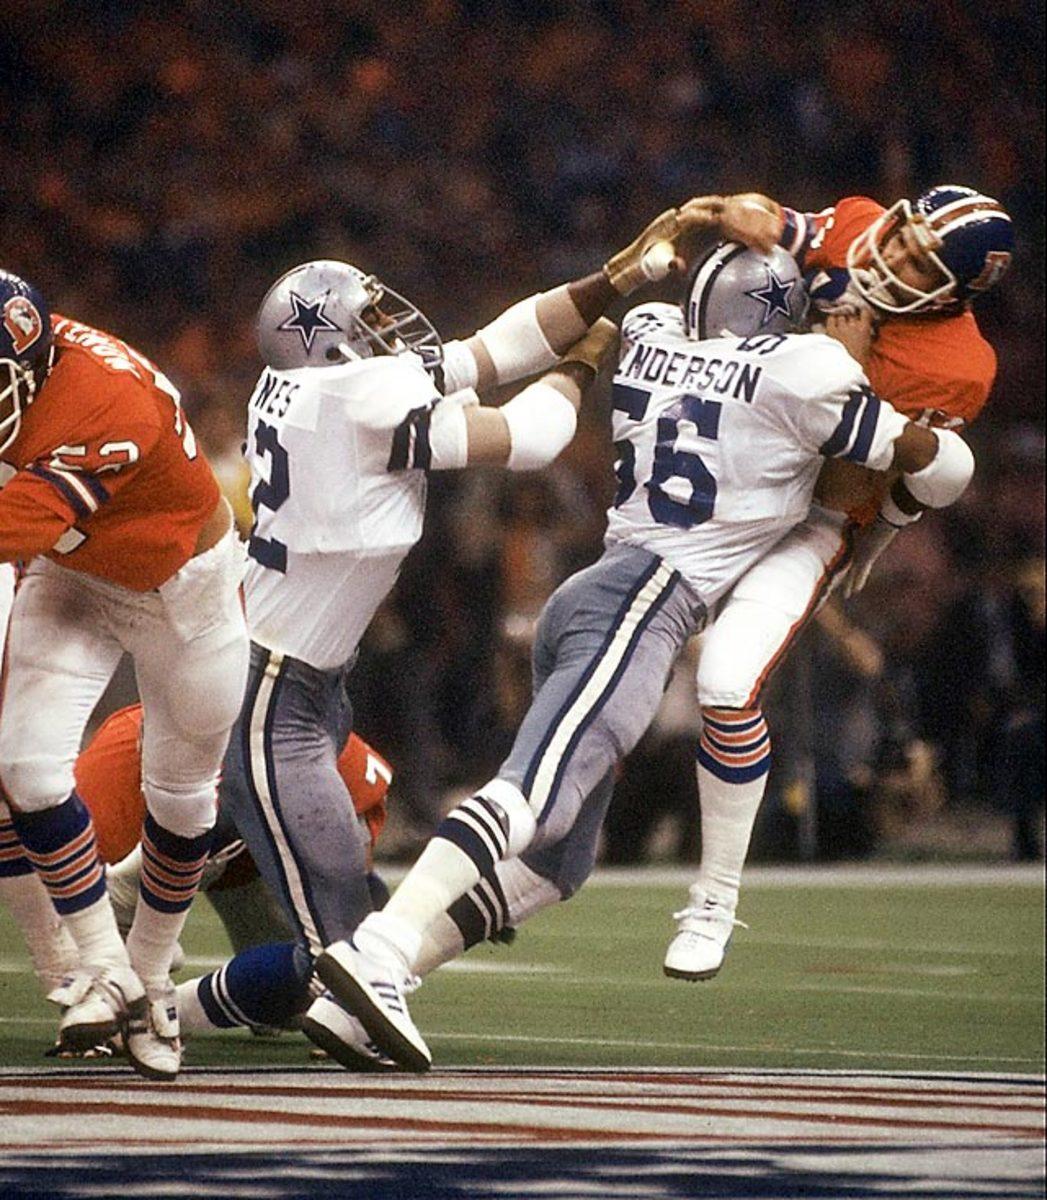 Super Bowl XII, Jan. 15, 1978